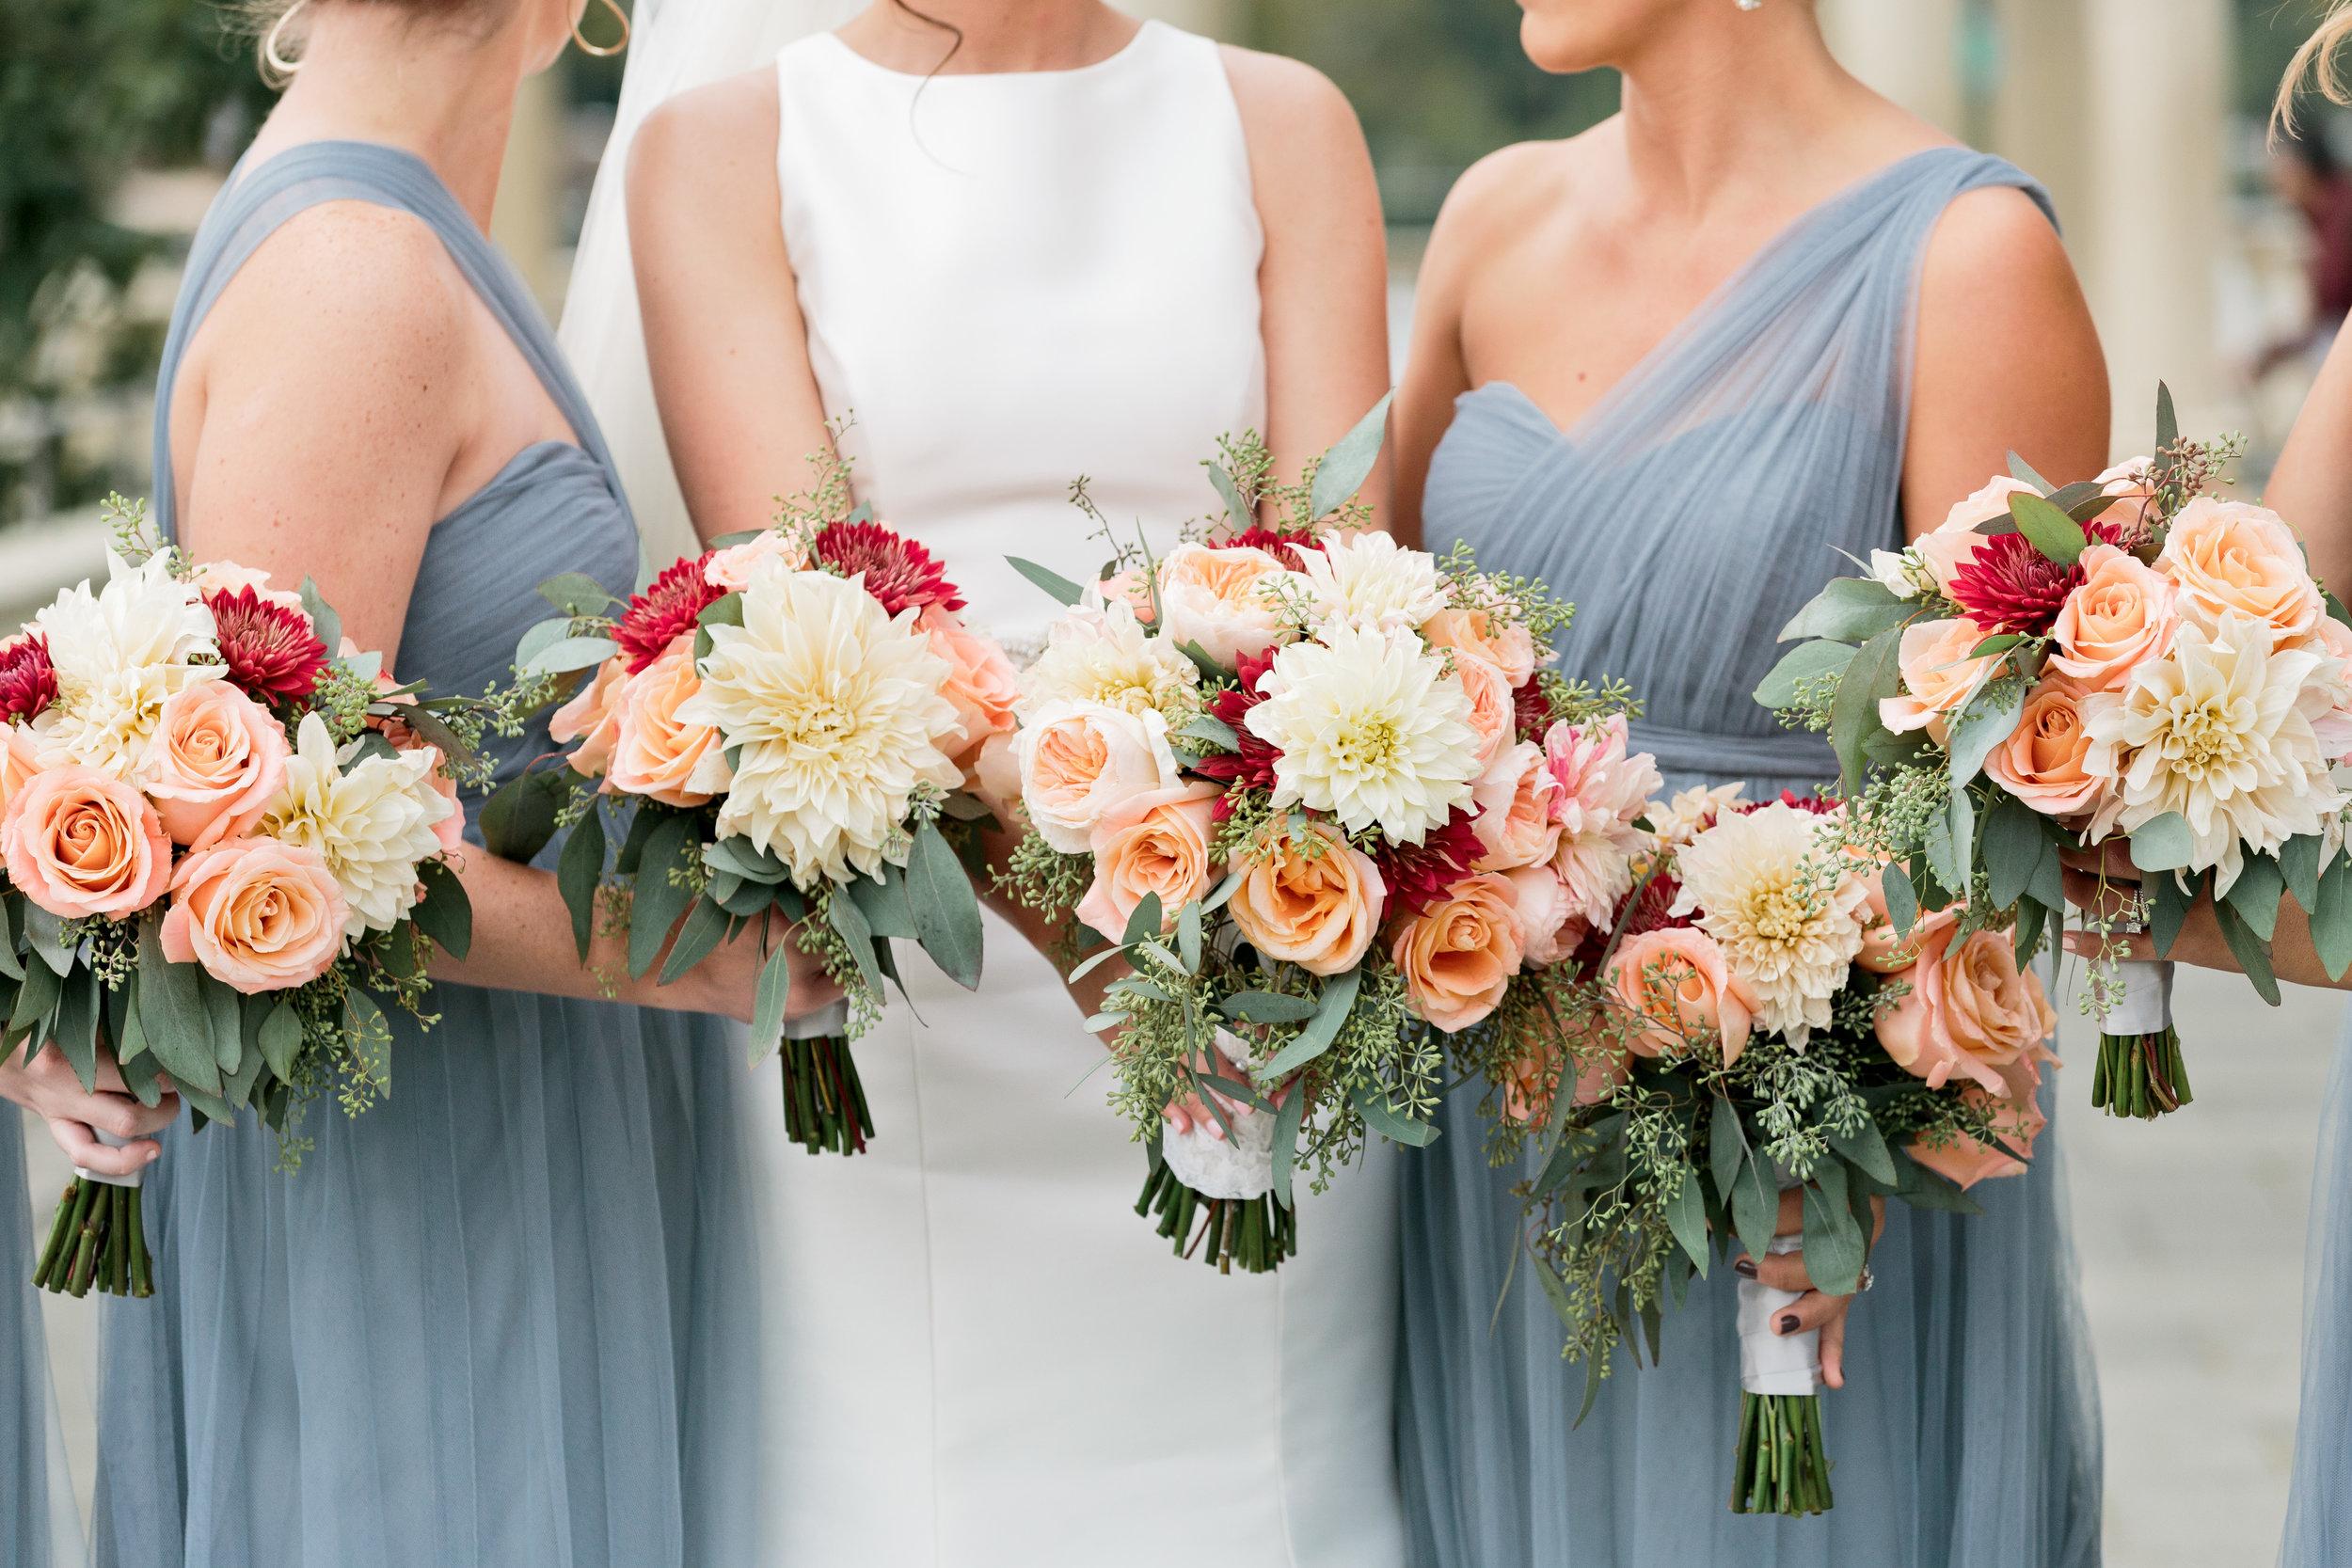 Hudson-Nichols-Black-Tie-Bride-Philadelphia-Waterworks-Wedding-Bridesmaids-Bouquets01.jpg